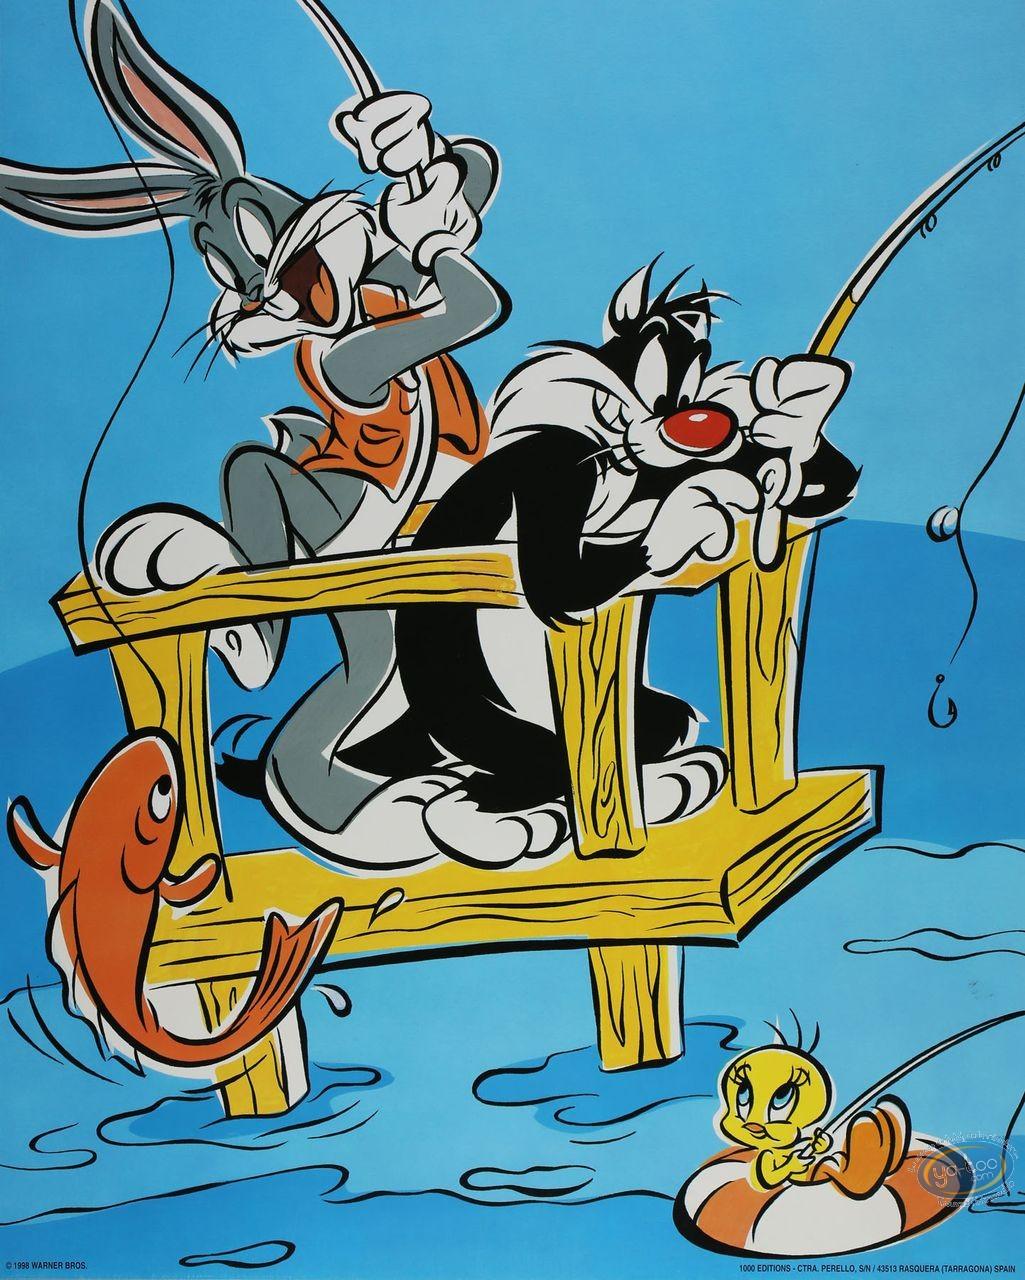 Offset Print, Looney Tunes (Les) : Gone Fishing 50X40 cm